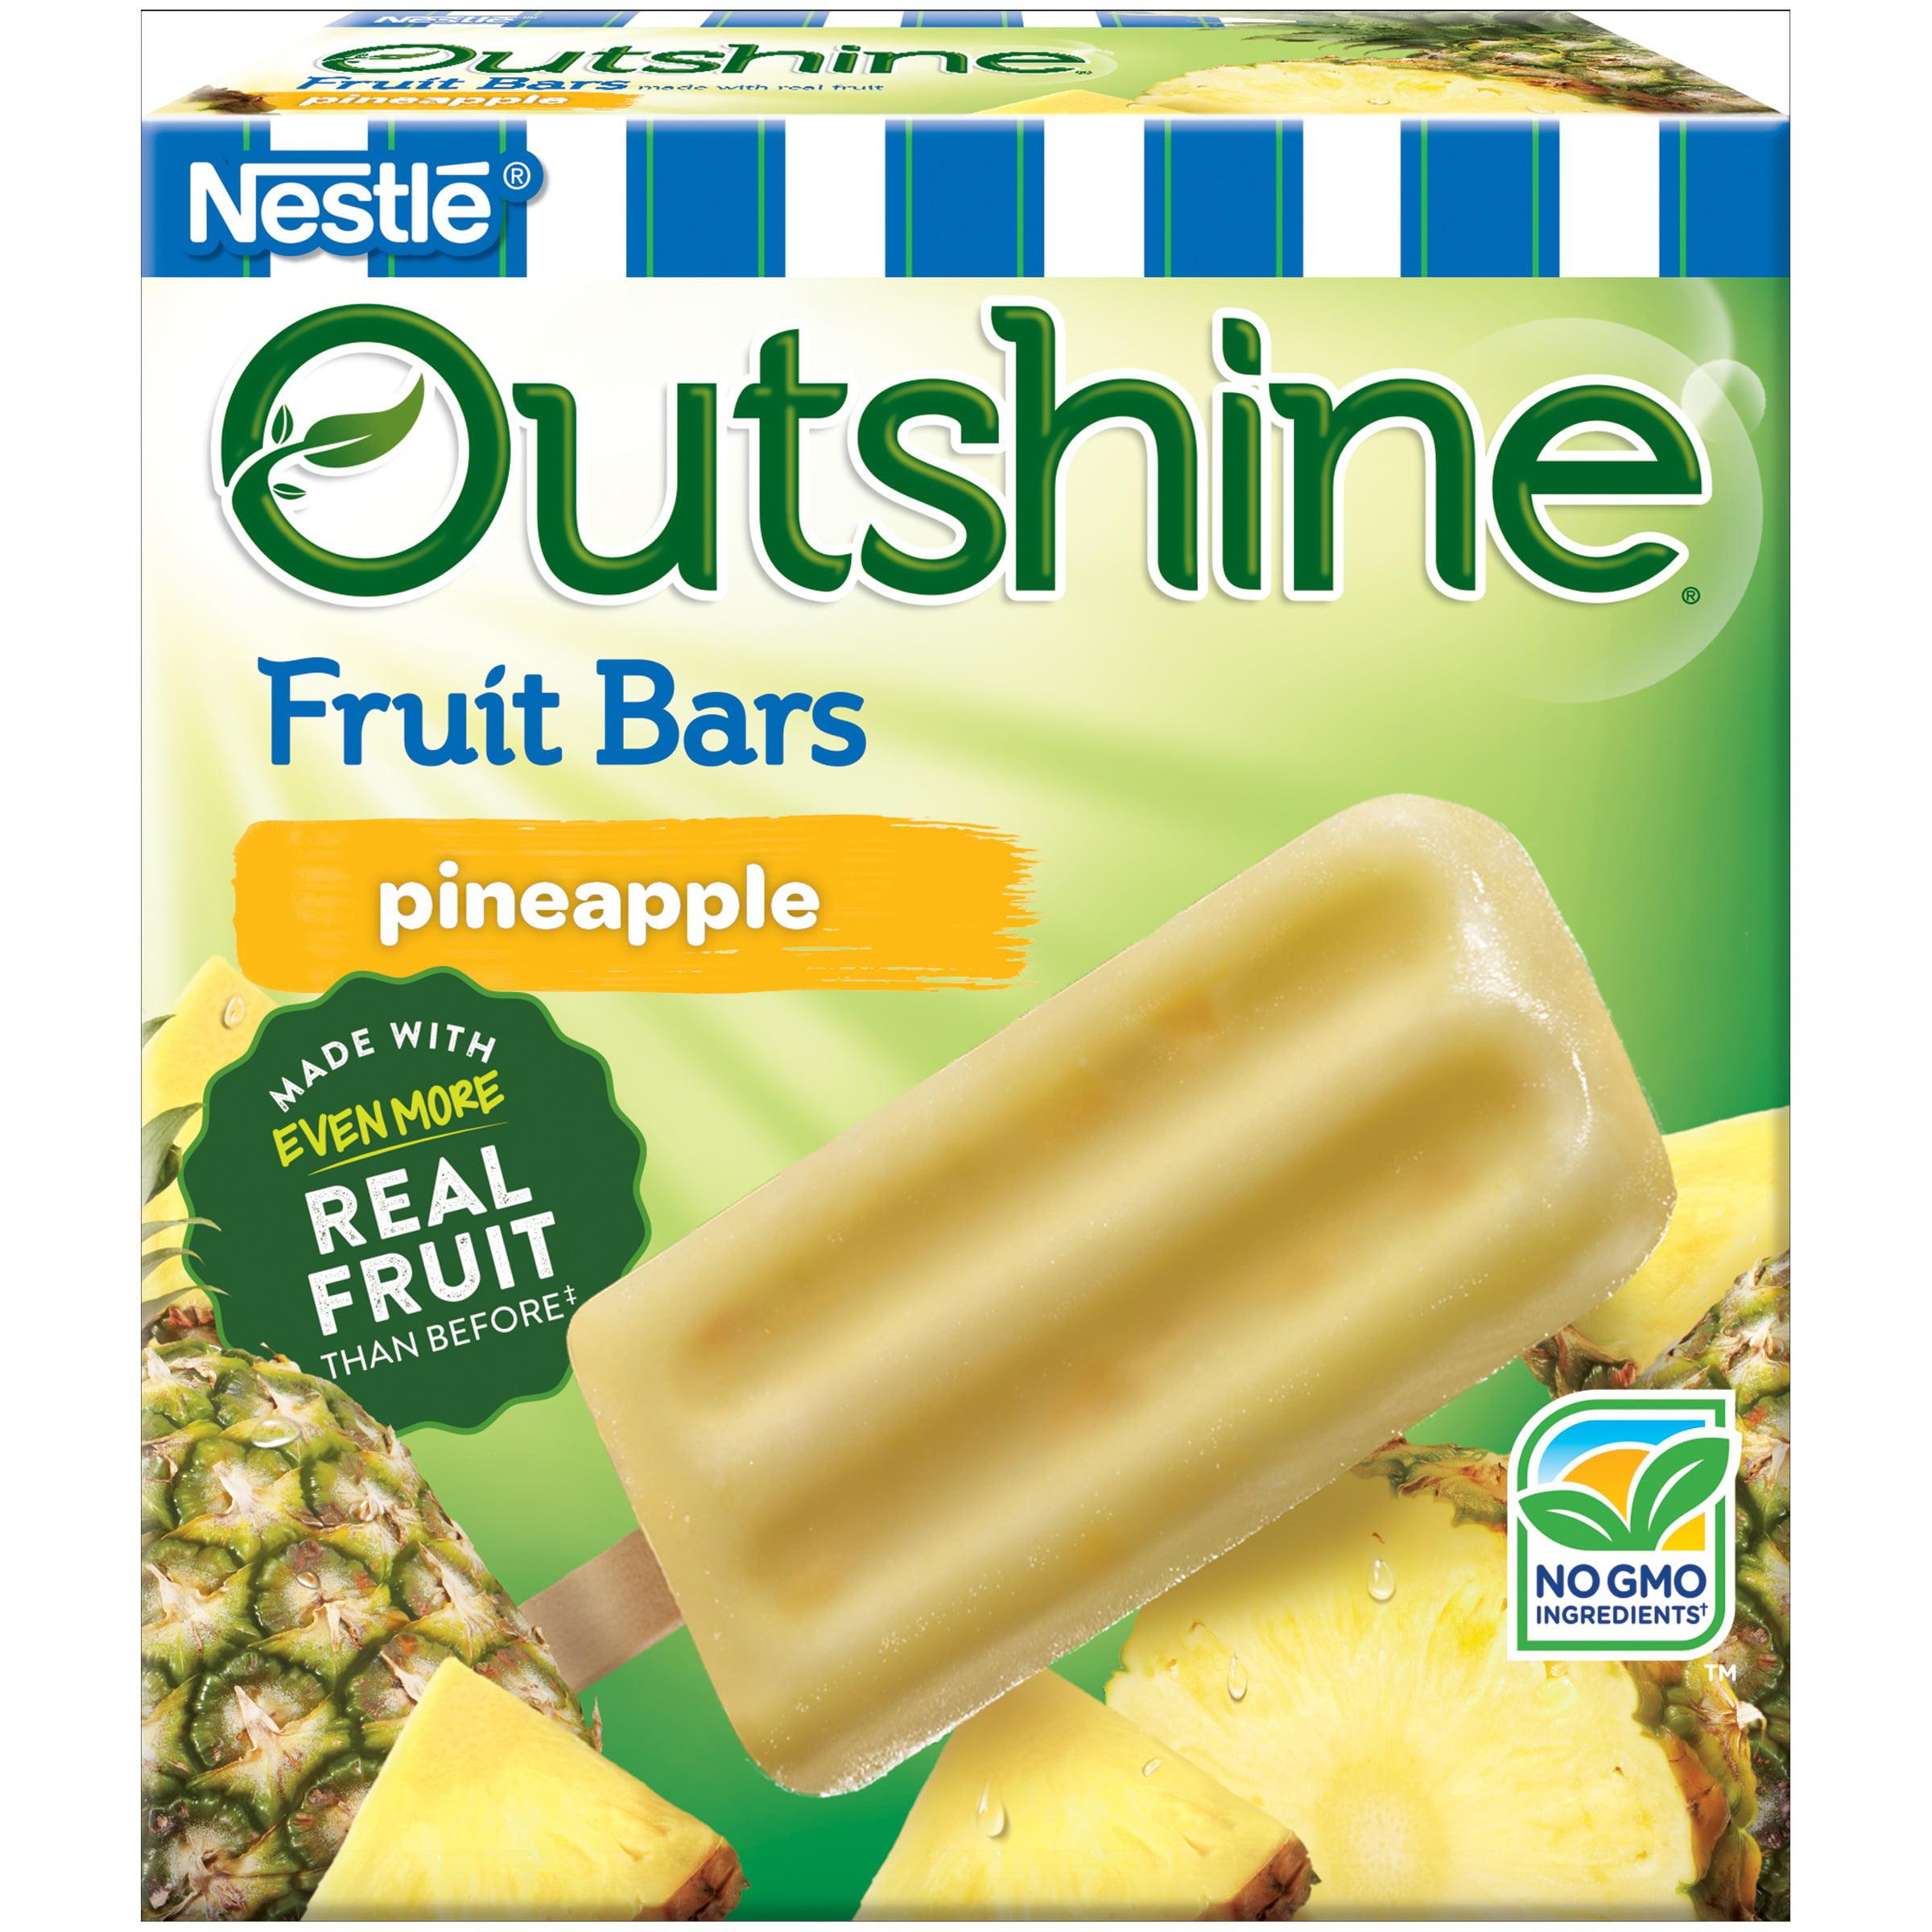 Outshine Fruit Bars, Pineapple 6 ct Box